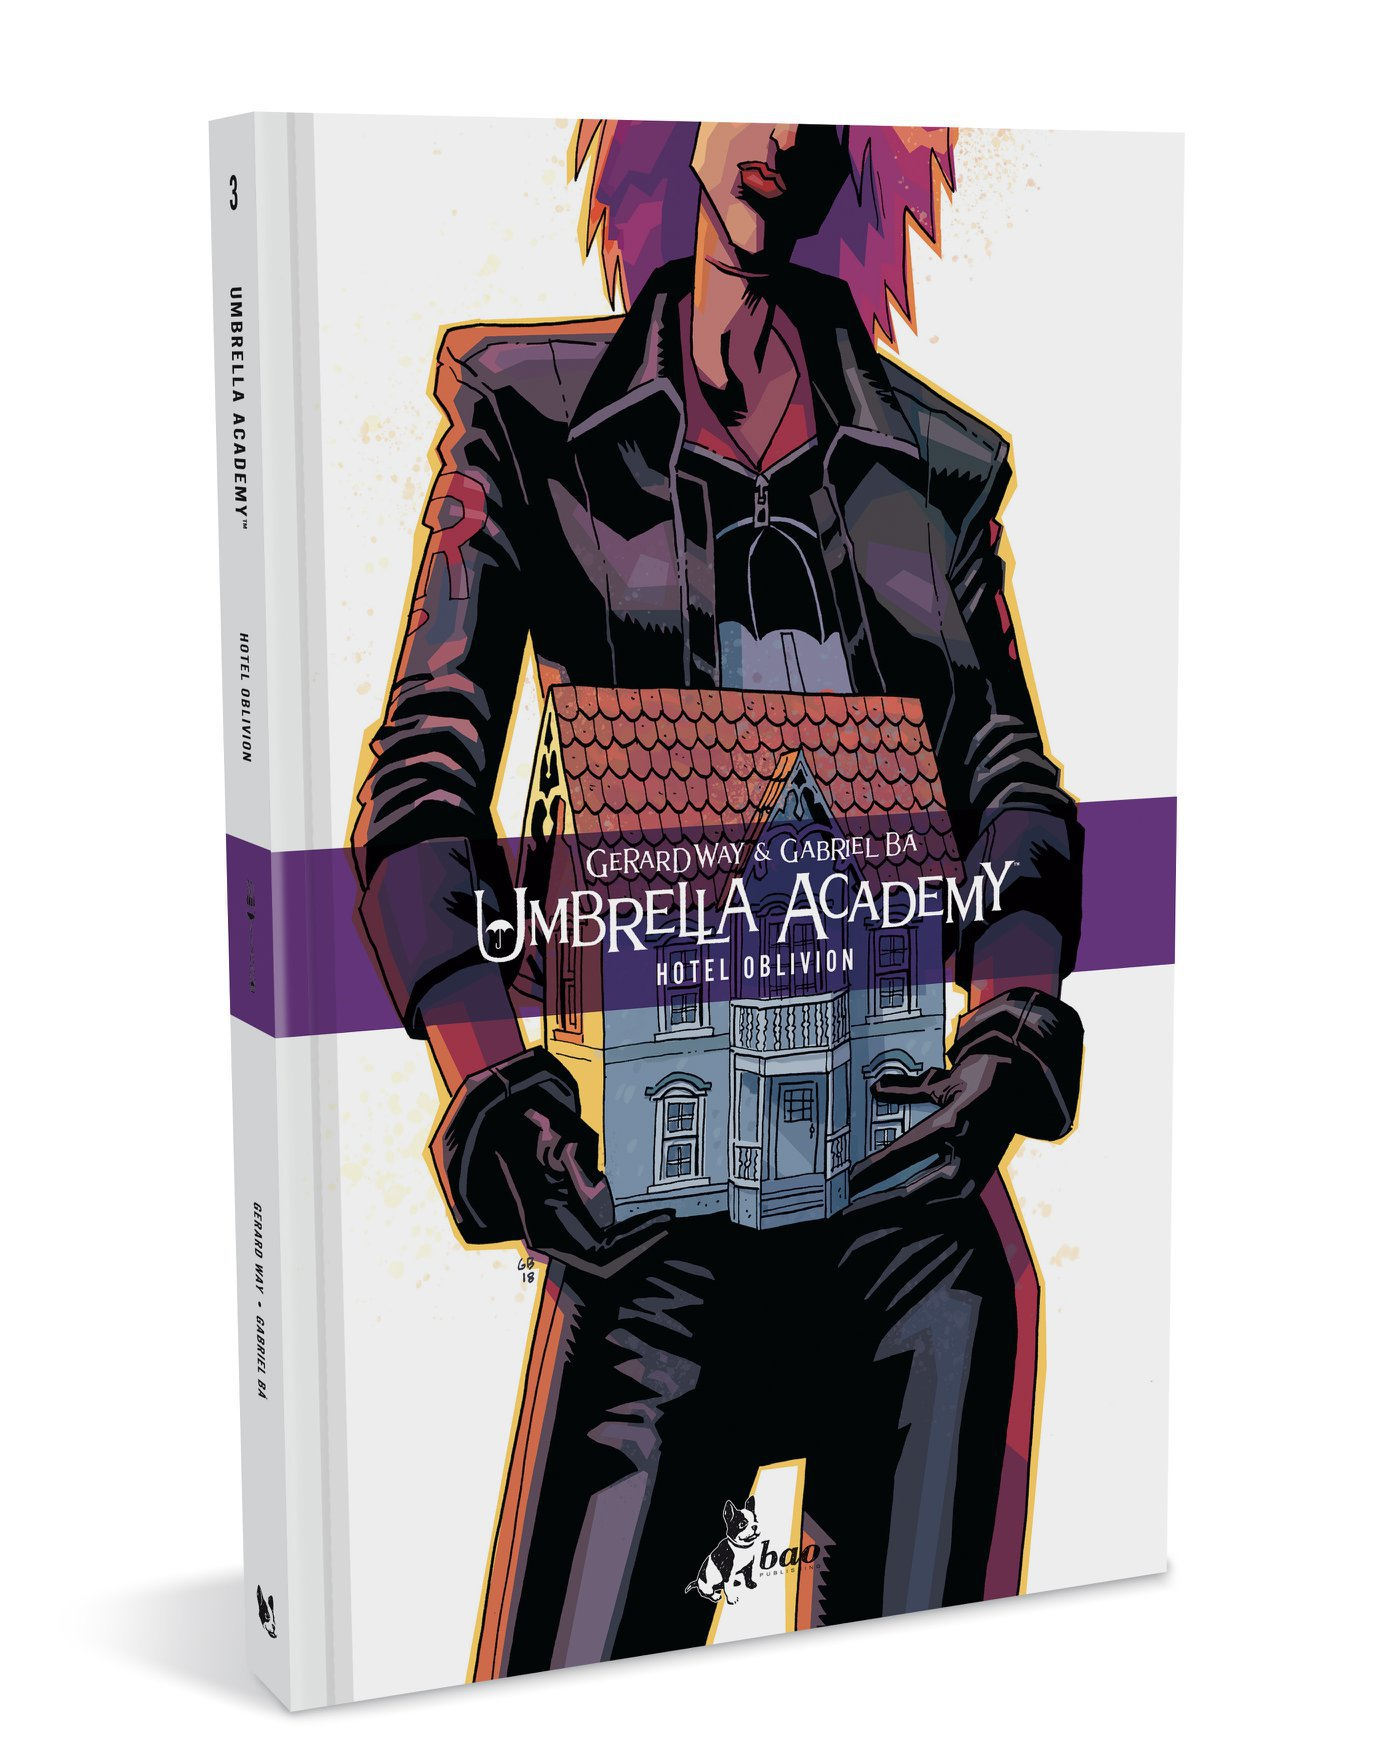 Umbrella Academy #3: Hotel Oblivion